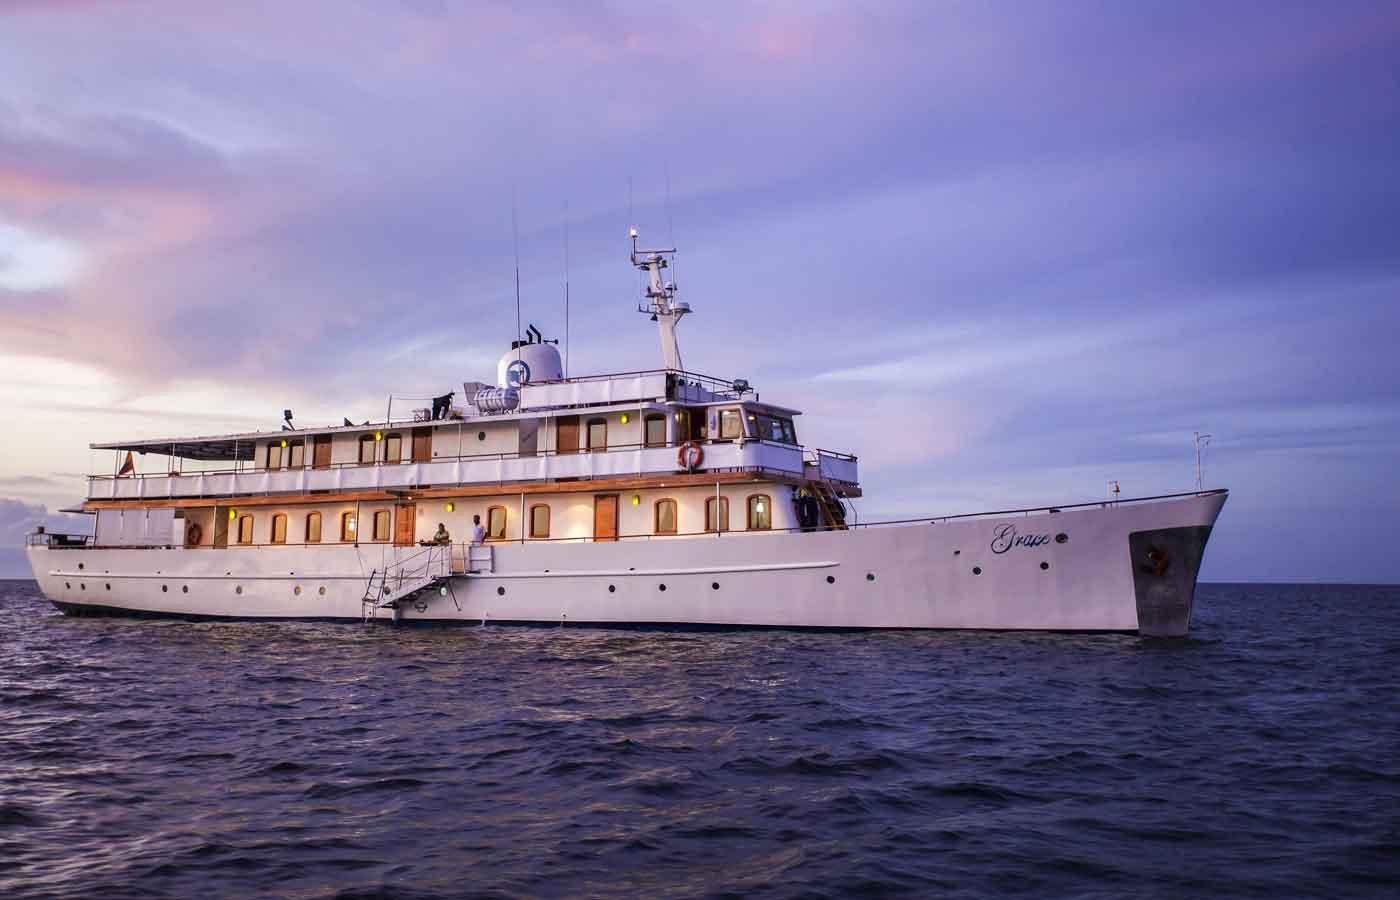 M/Y Grace - Luxury Galapagos Yacht